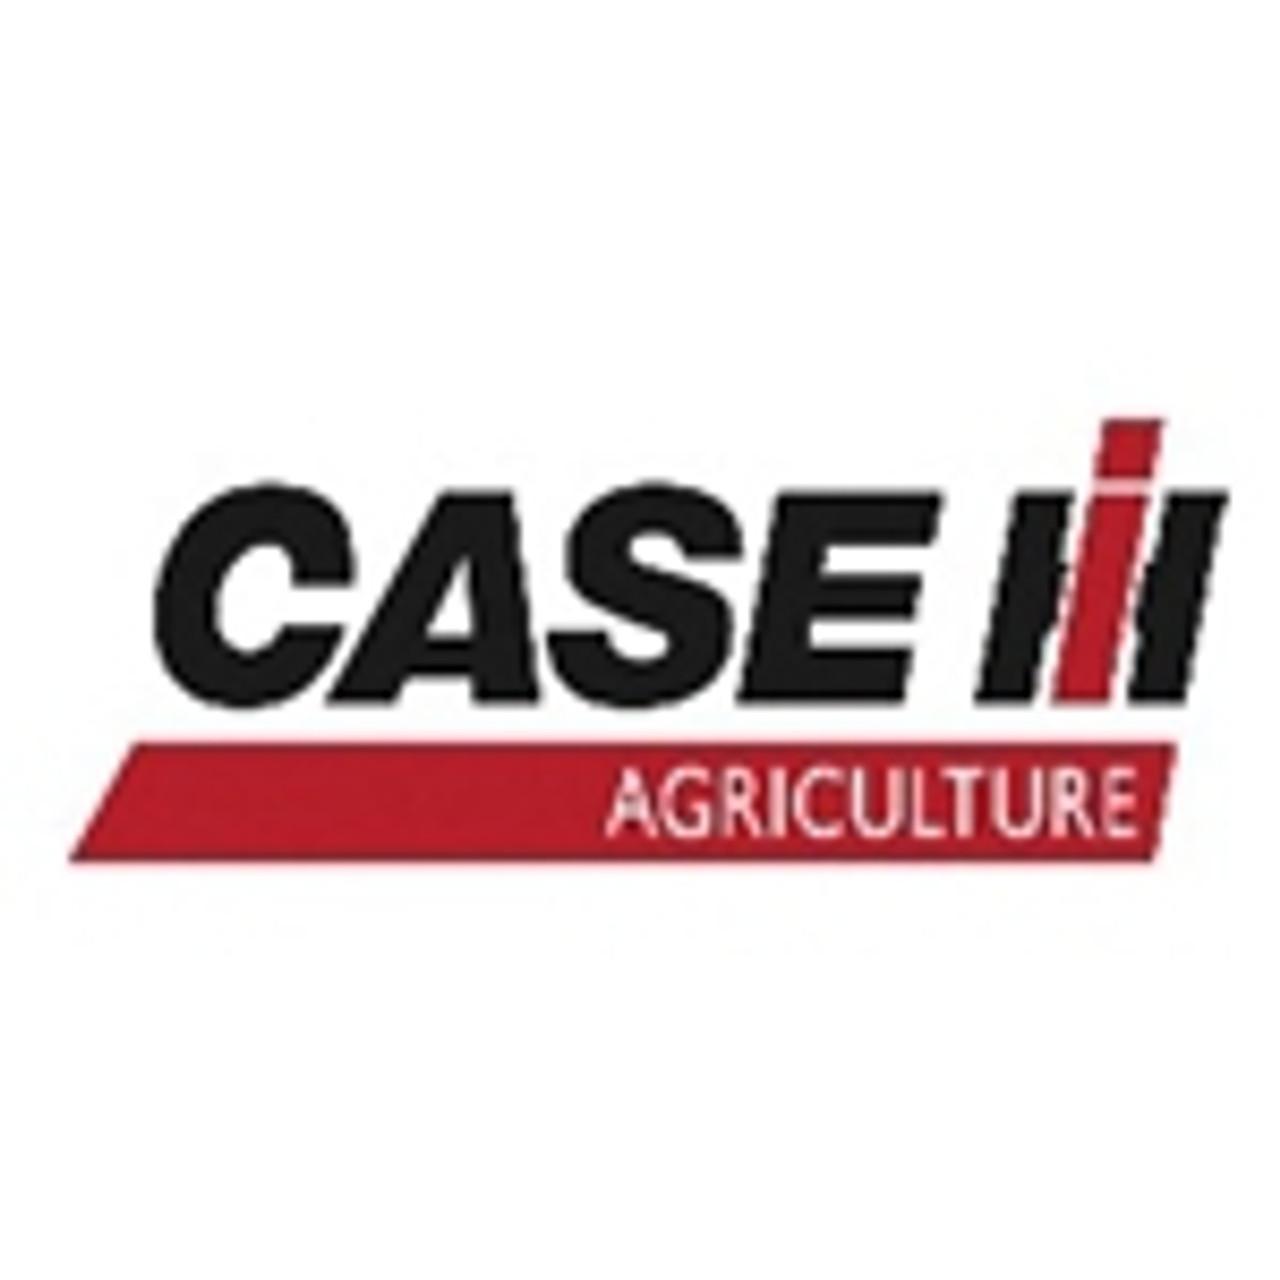 Case Engines